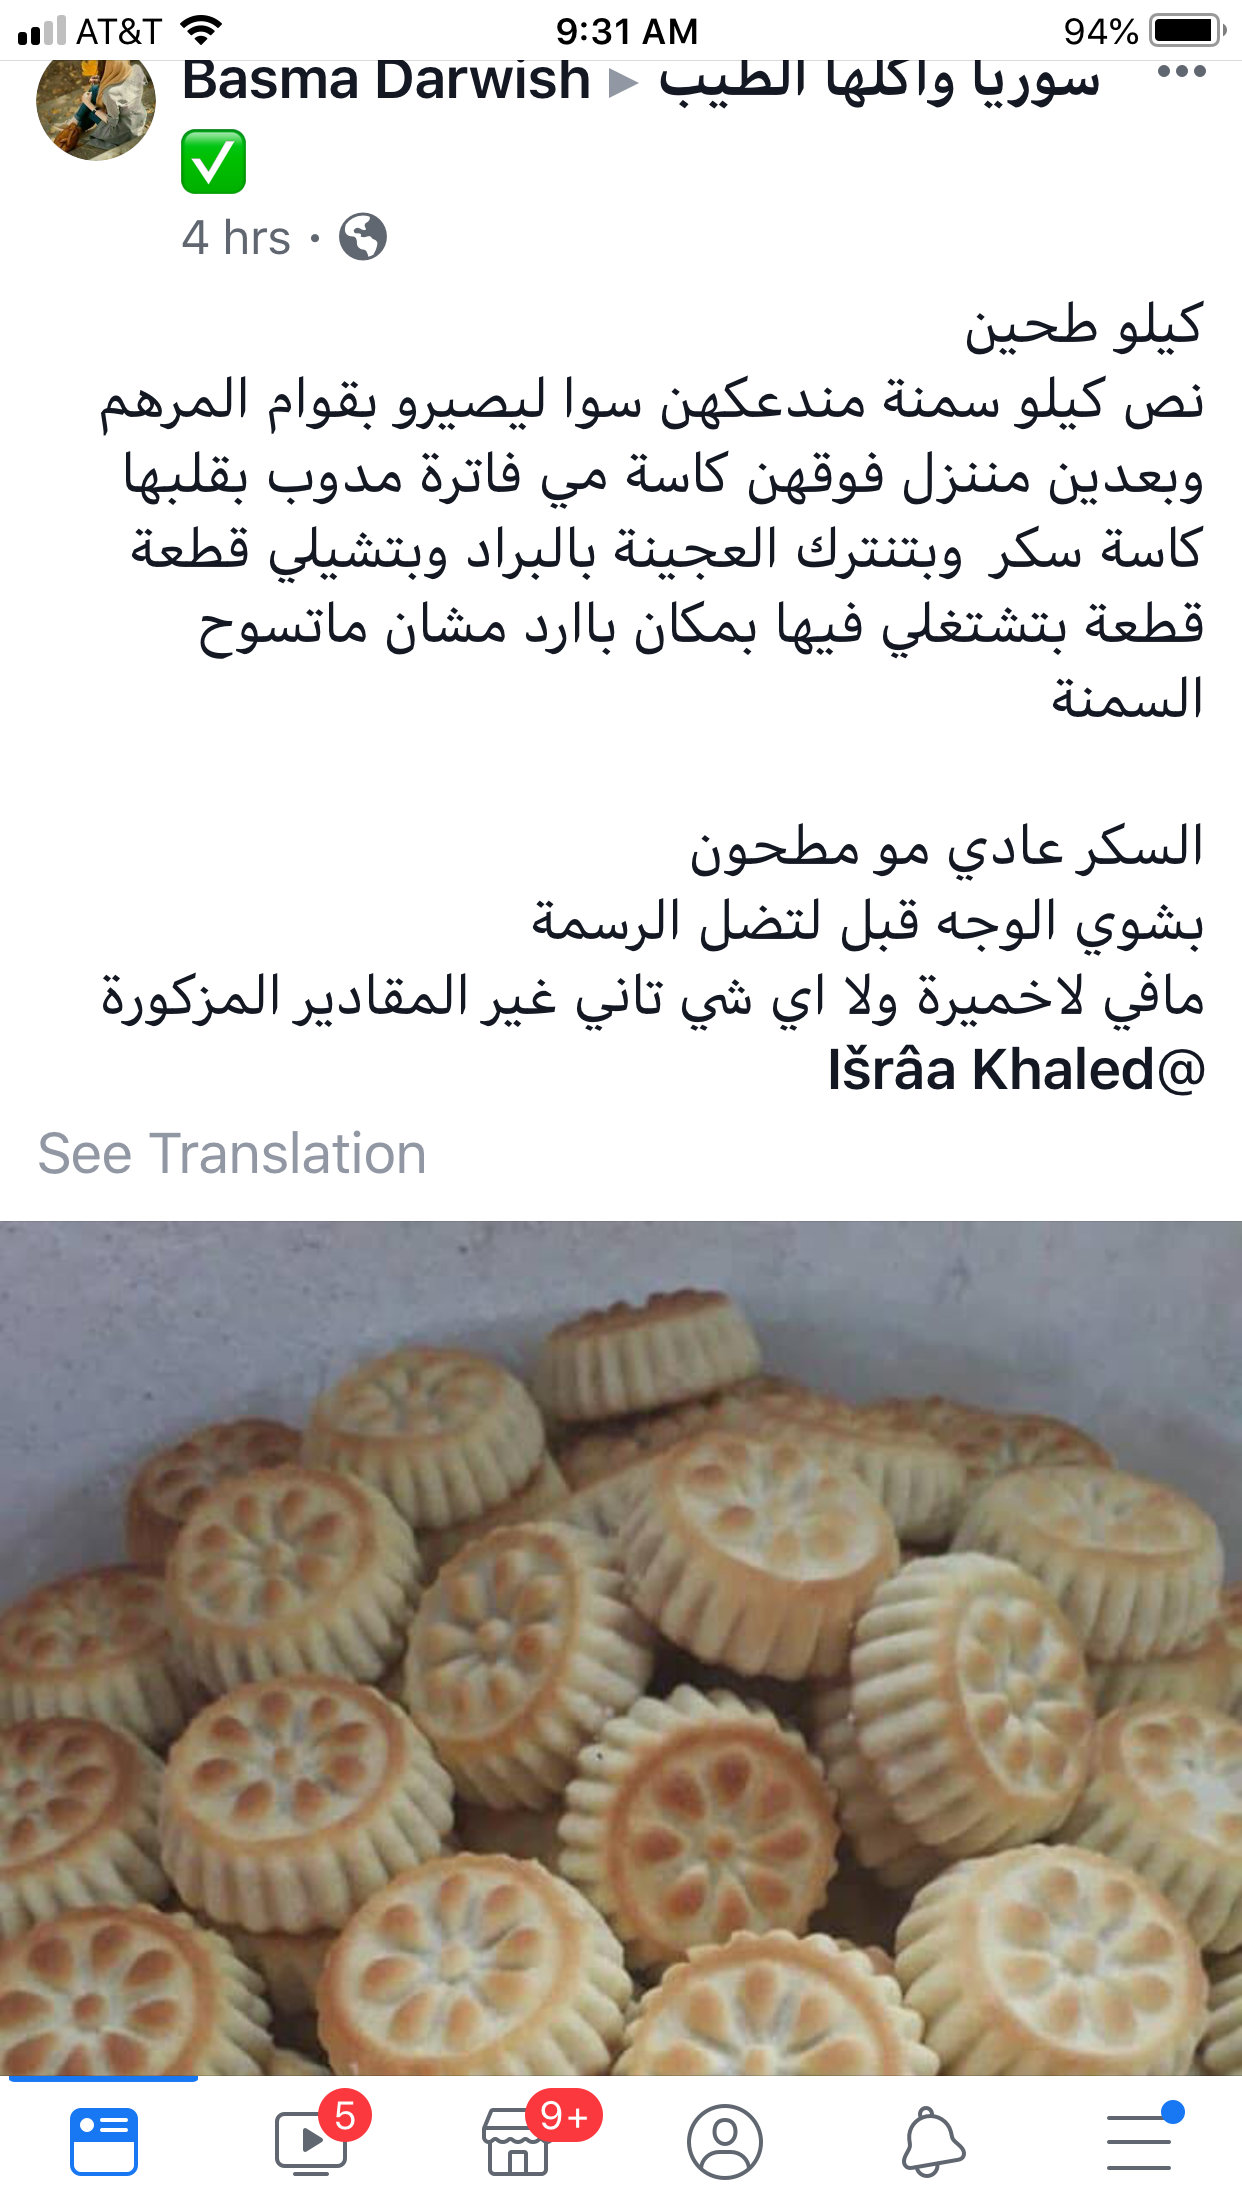 معمول غريبة Middle Eastern Recipes Food Middle Eastern